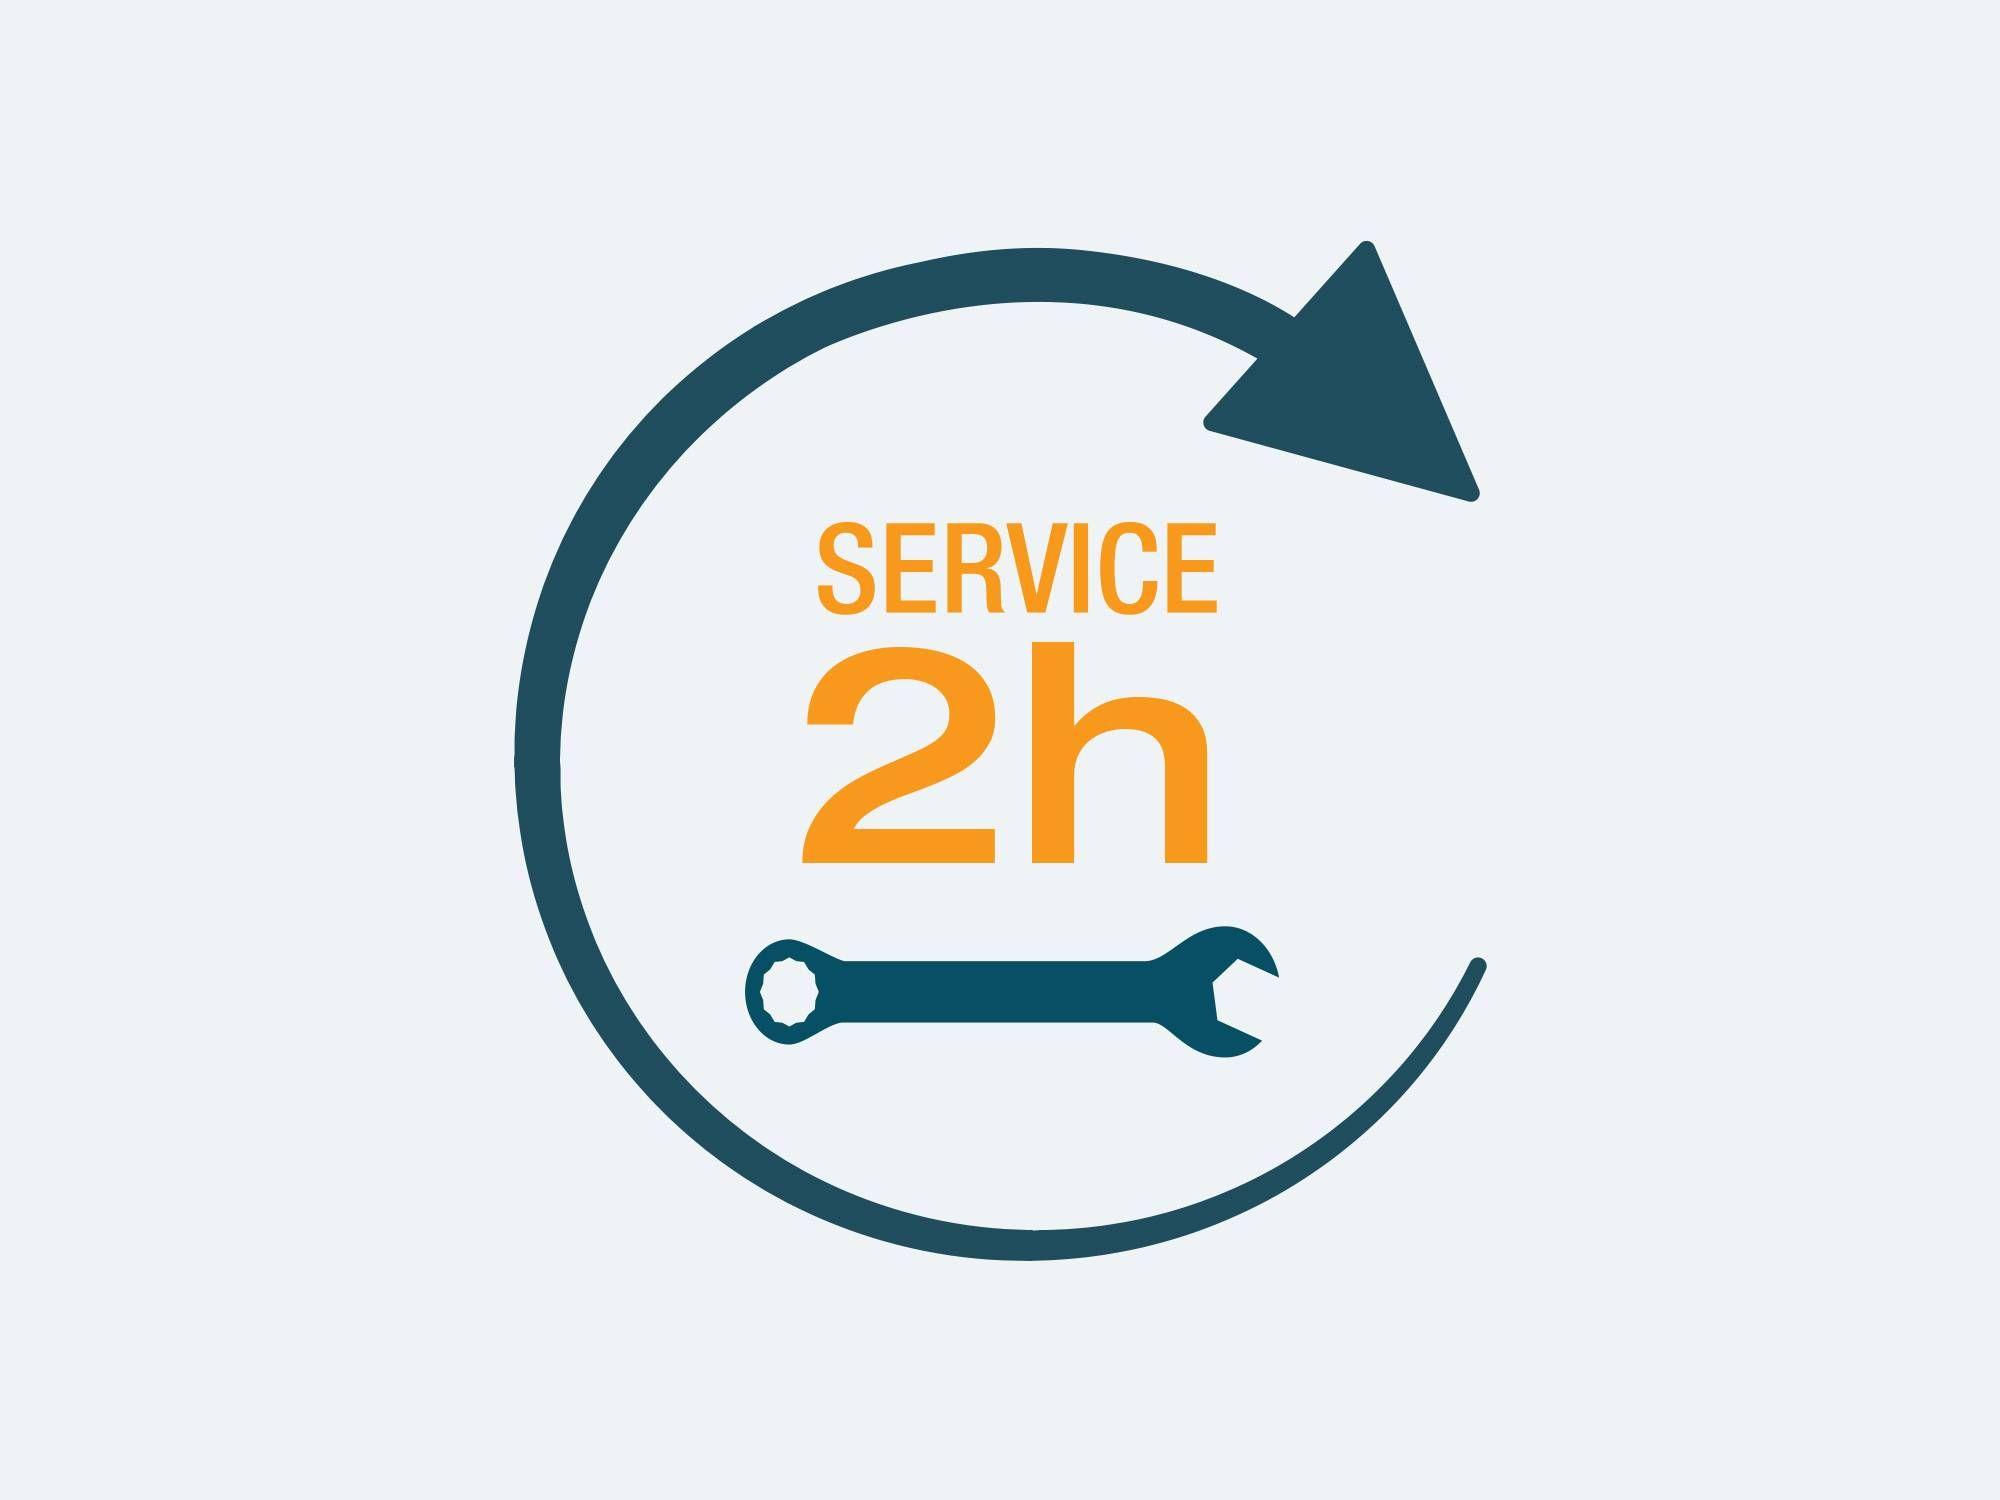 2H_serviceRWD Image (2000 x 1500).jpg